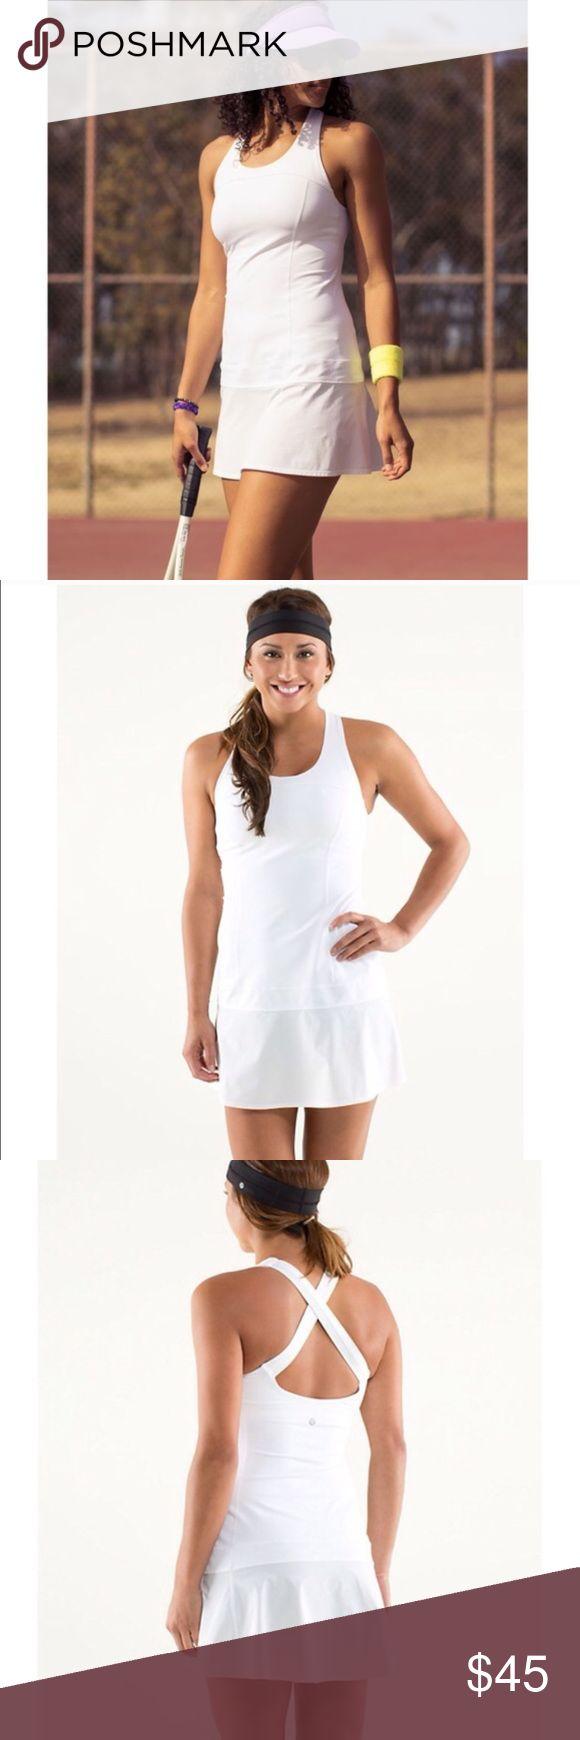 Lululemon dress Tennis dress. No flaws. Awesome condition. Built in bra. lululemon athletica Dresses